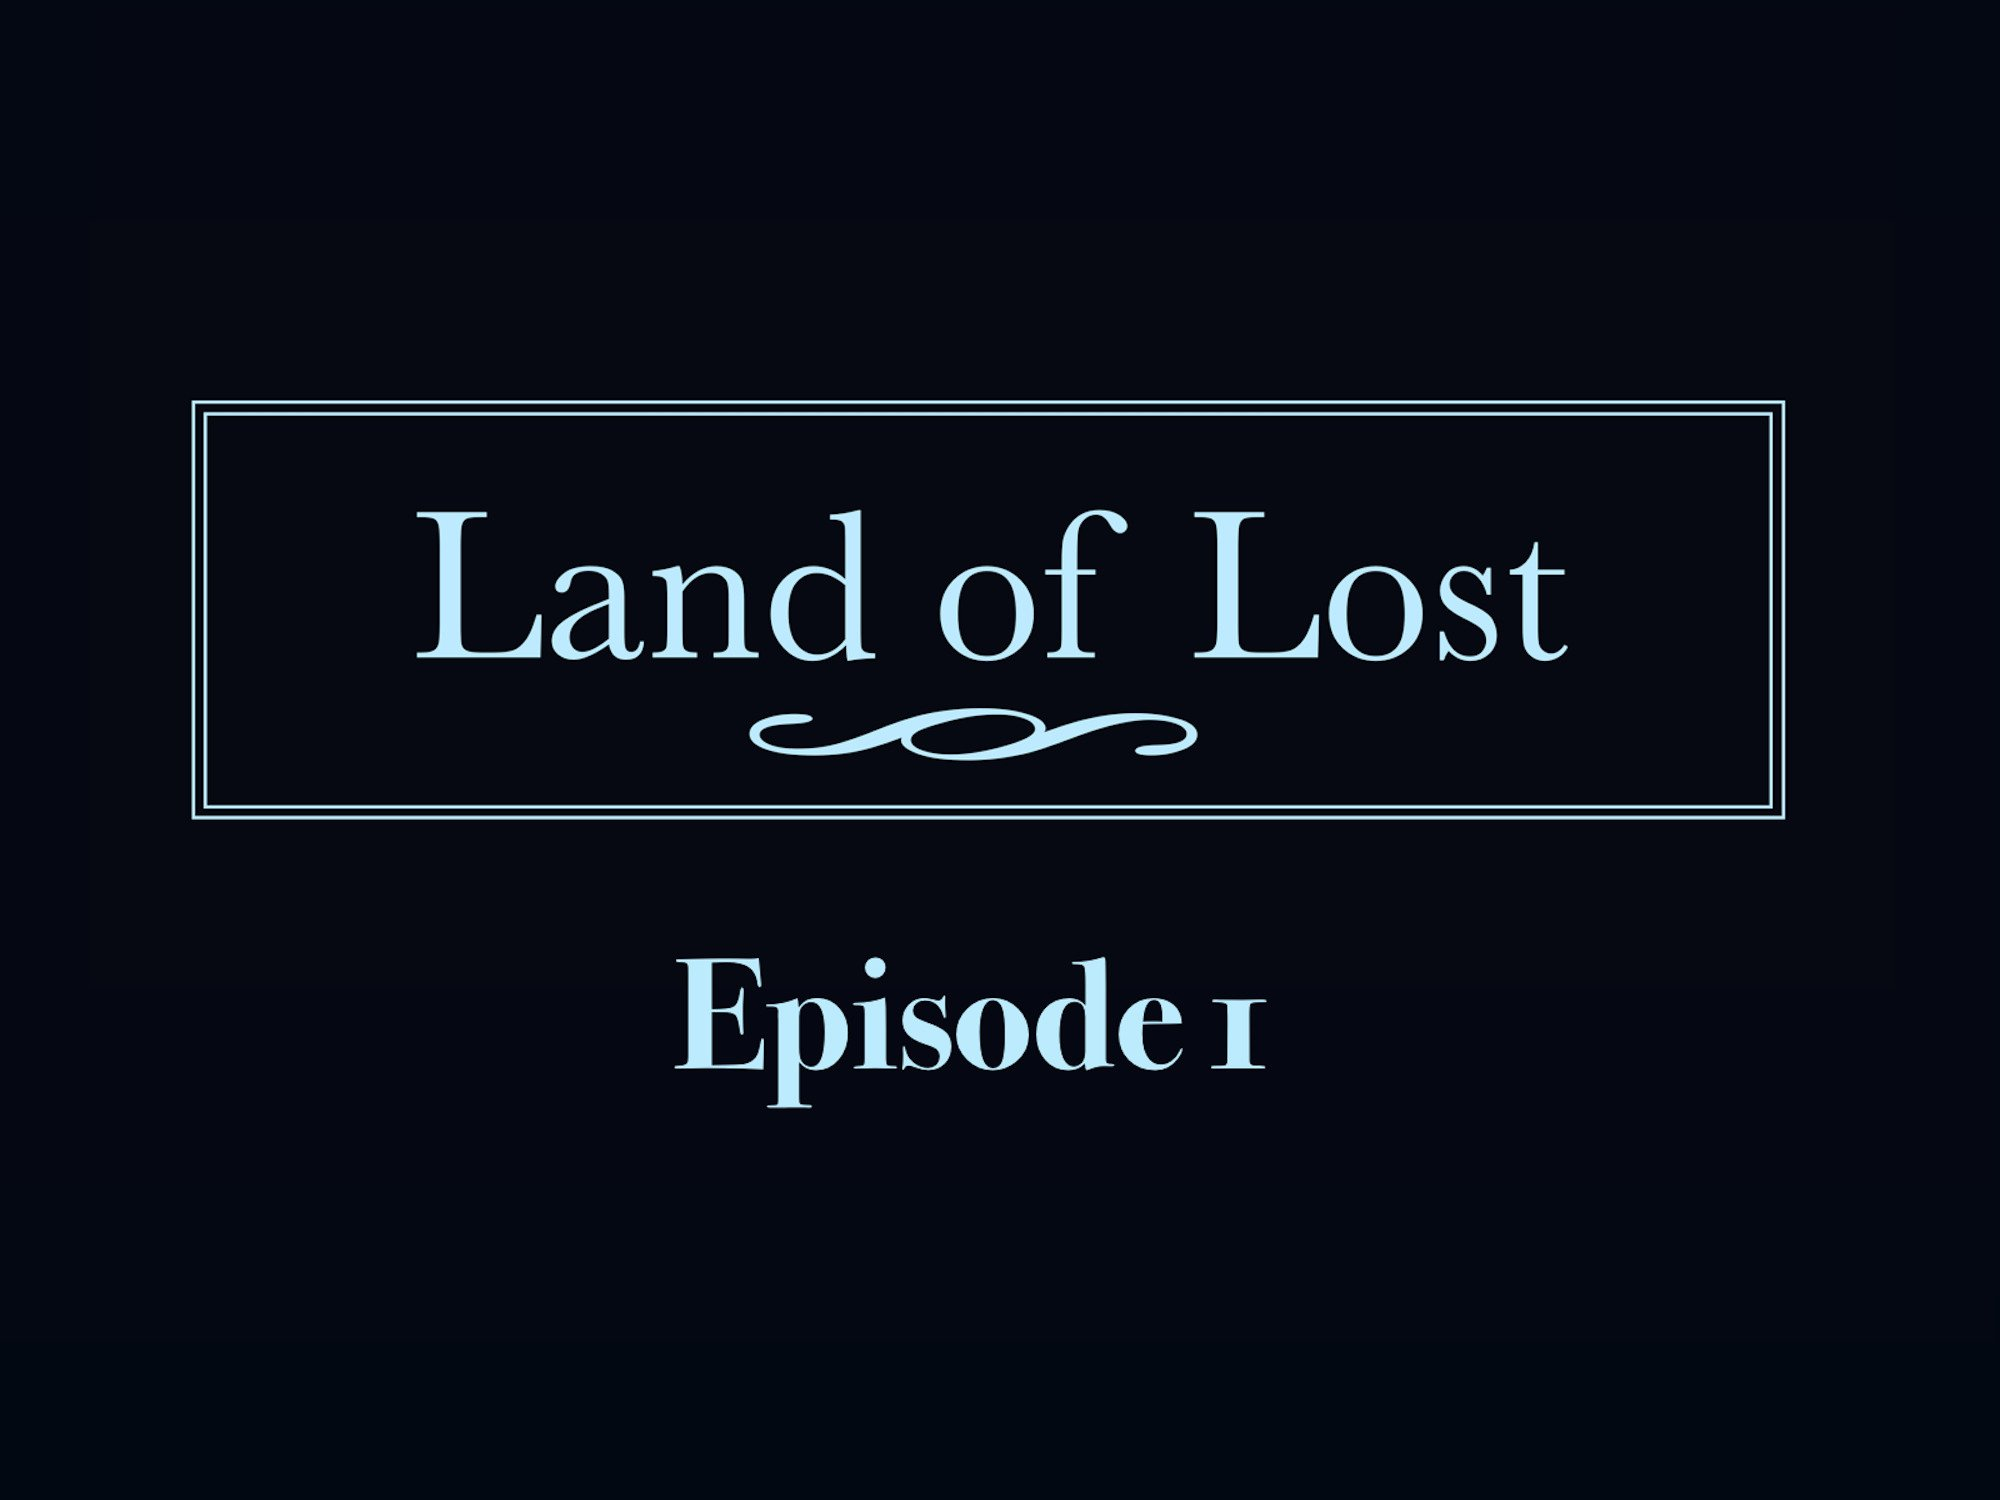 Land of Lost - Season 1